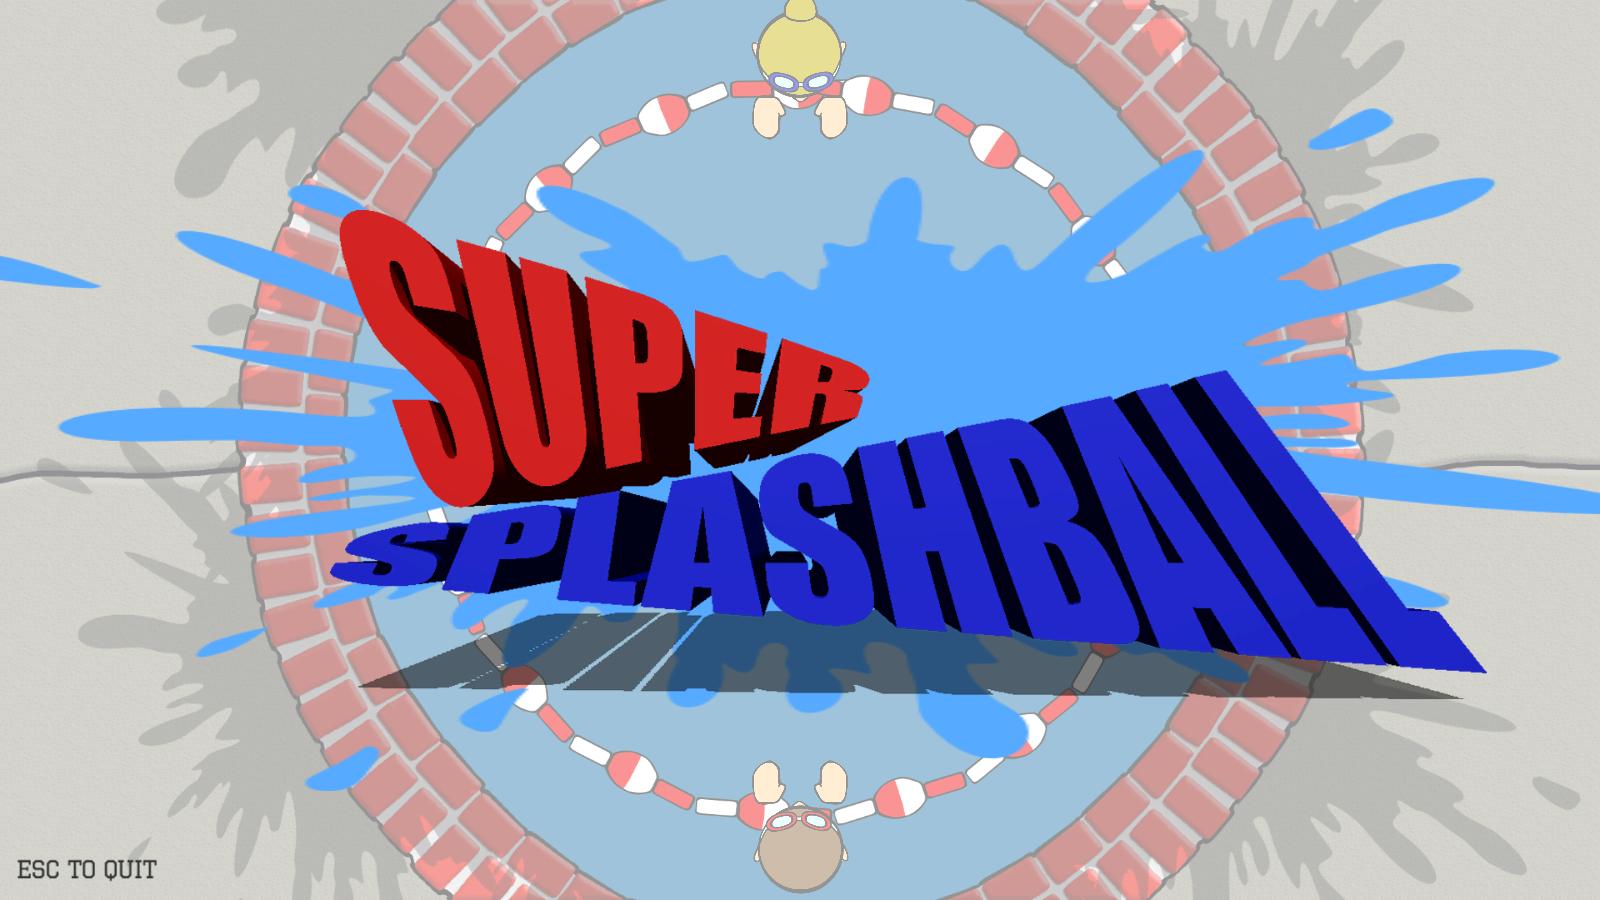 Super Splashball